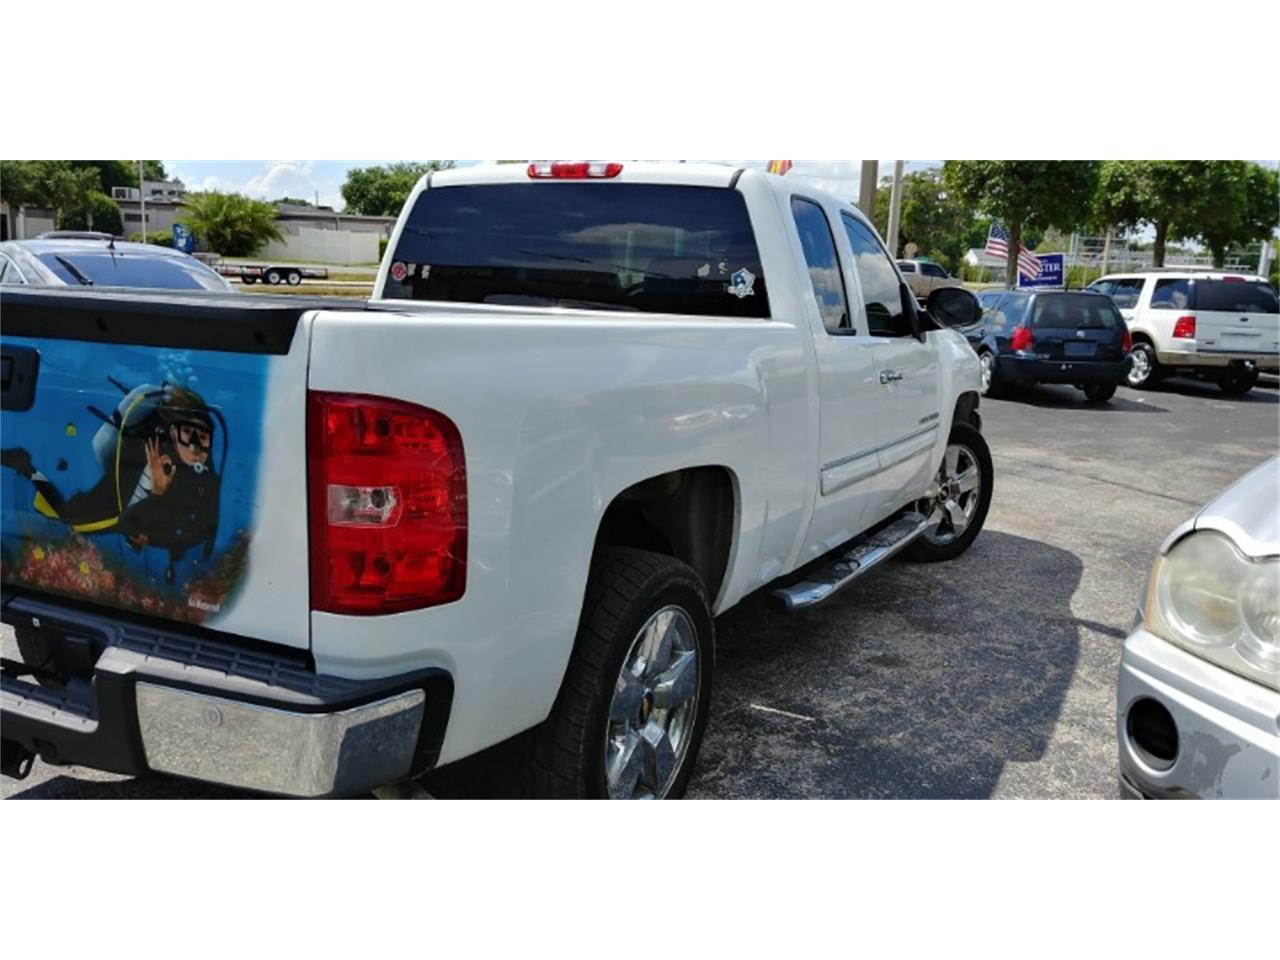 2011 Chevrolet Silverado (CC-1207087) for sale in Tavares, Florida